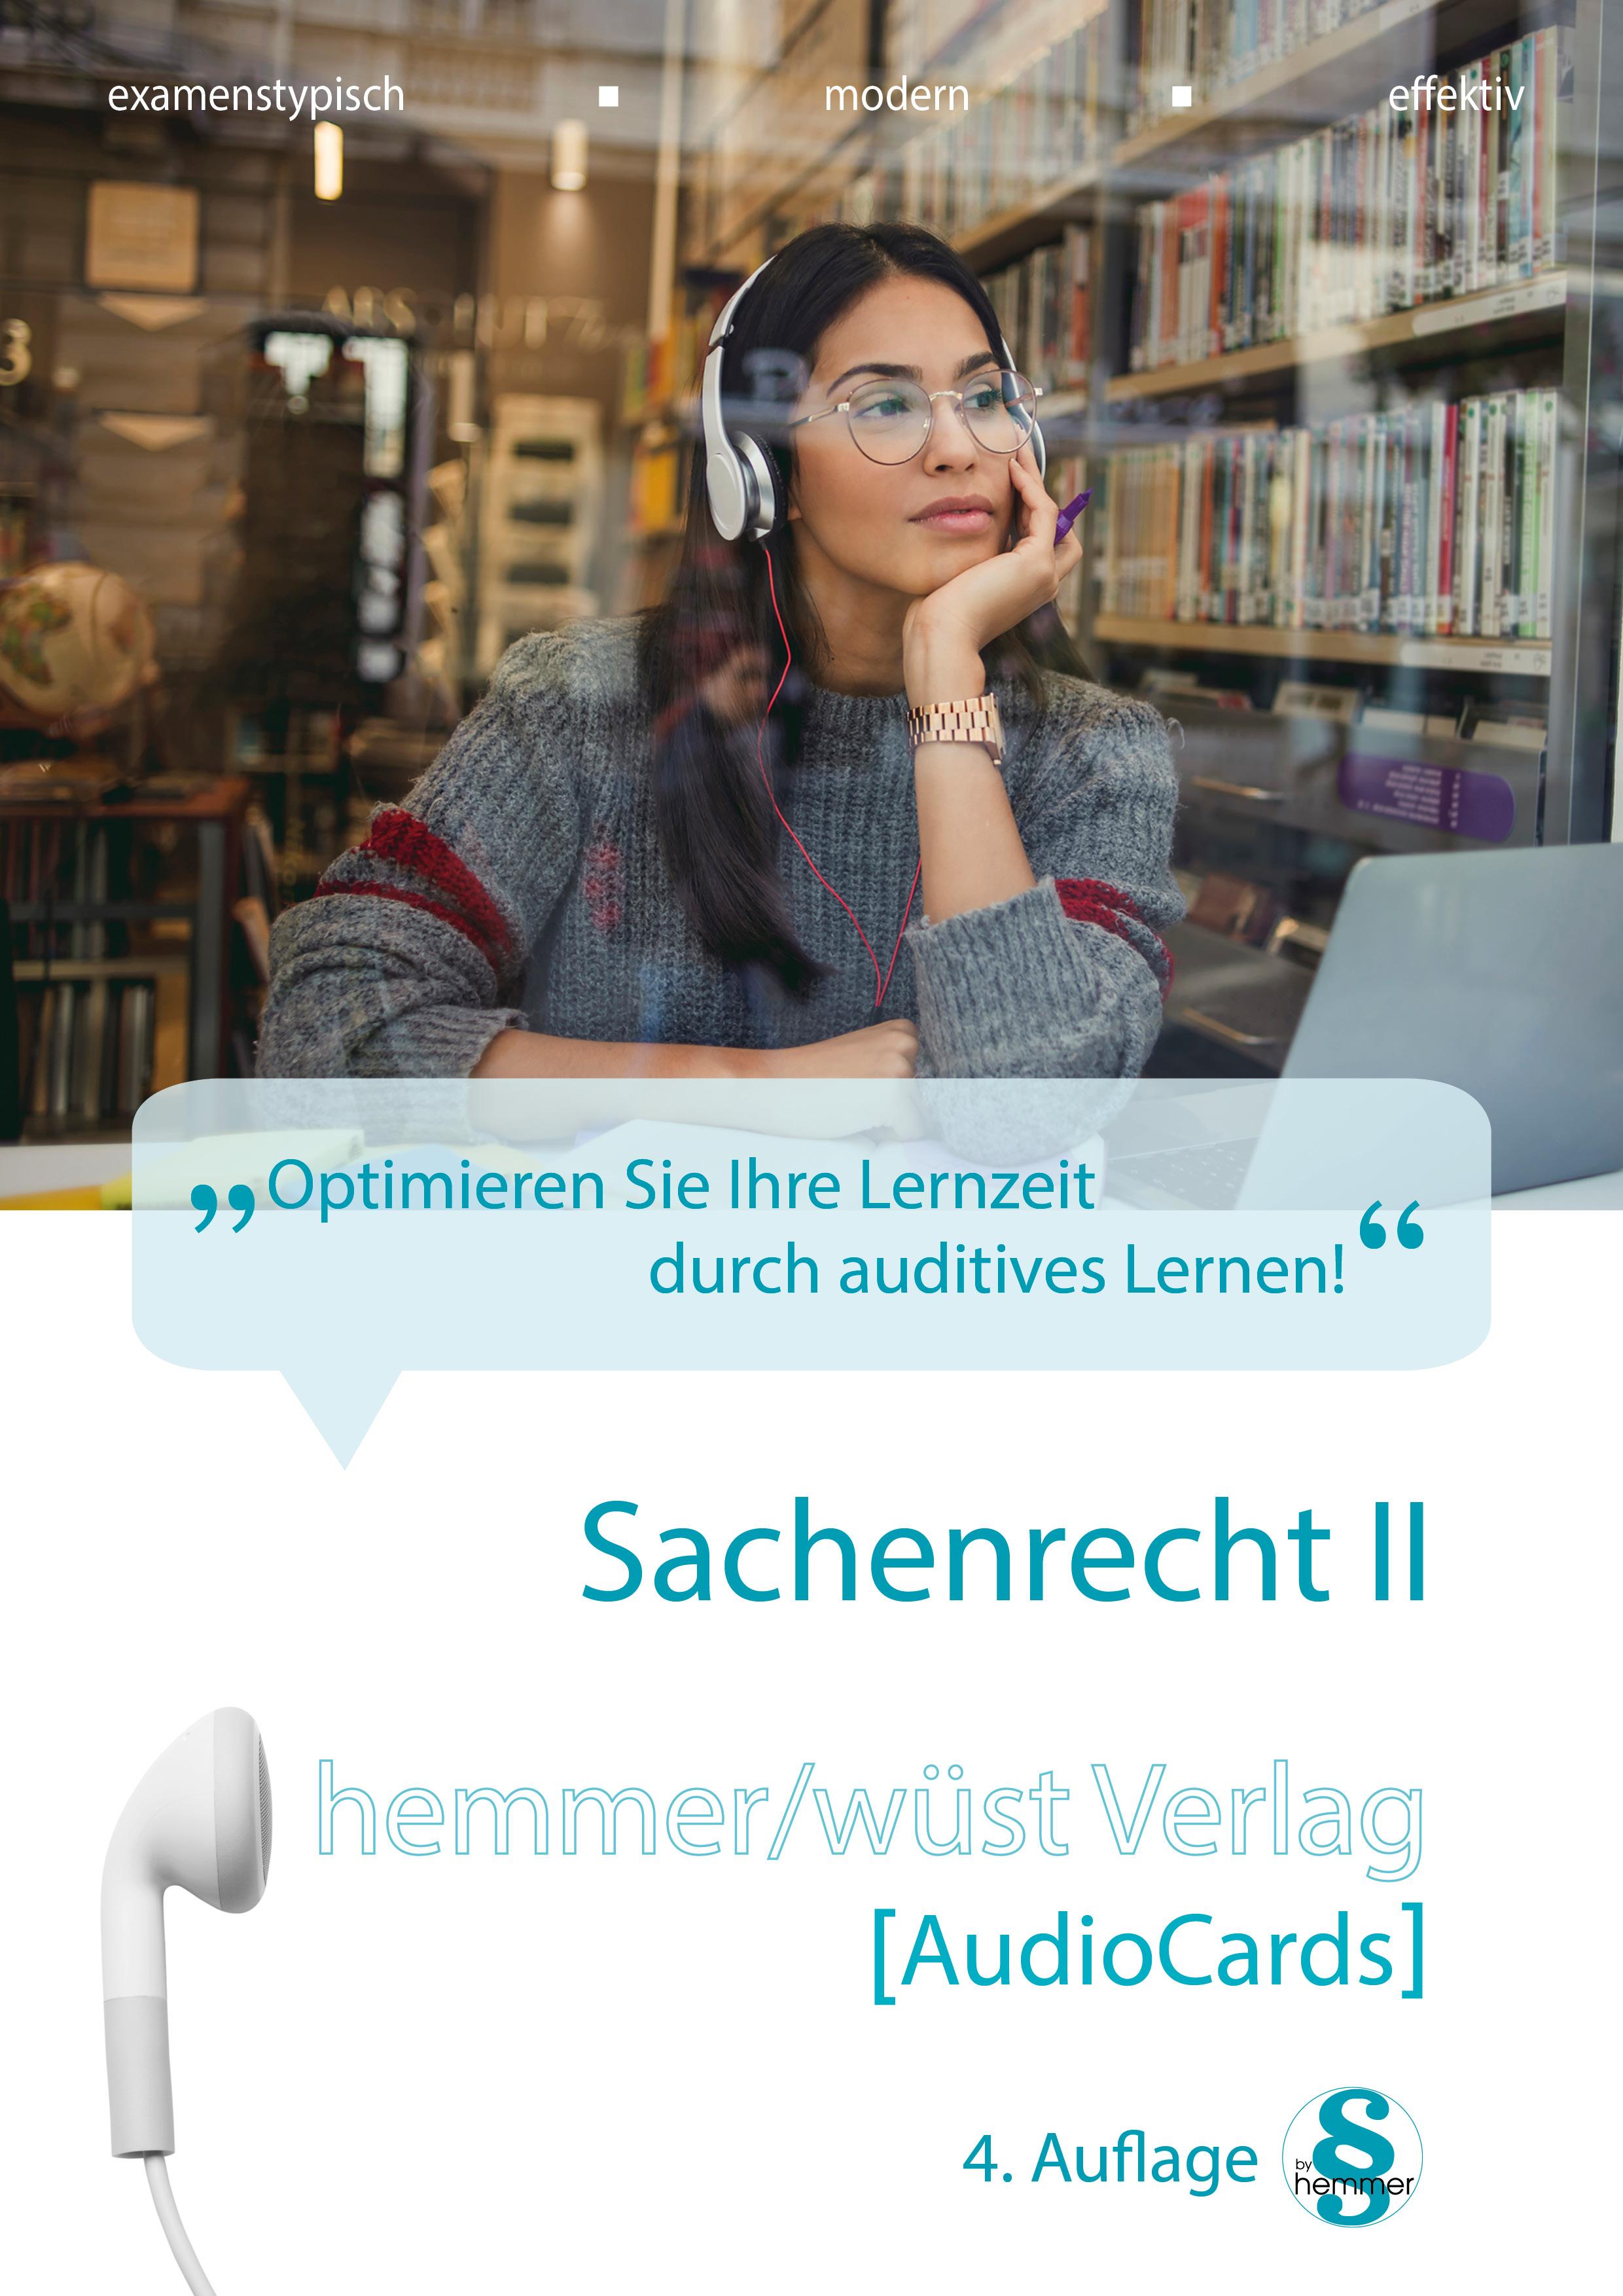 Audiocards - Sachenrecht II - Download